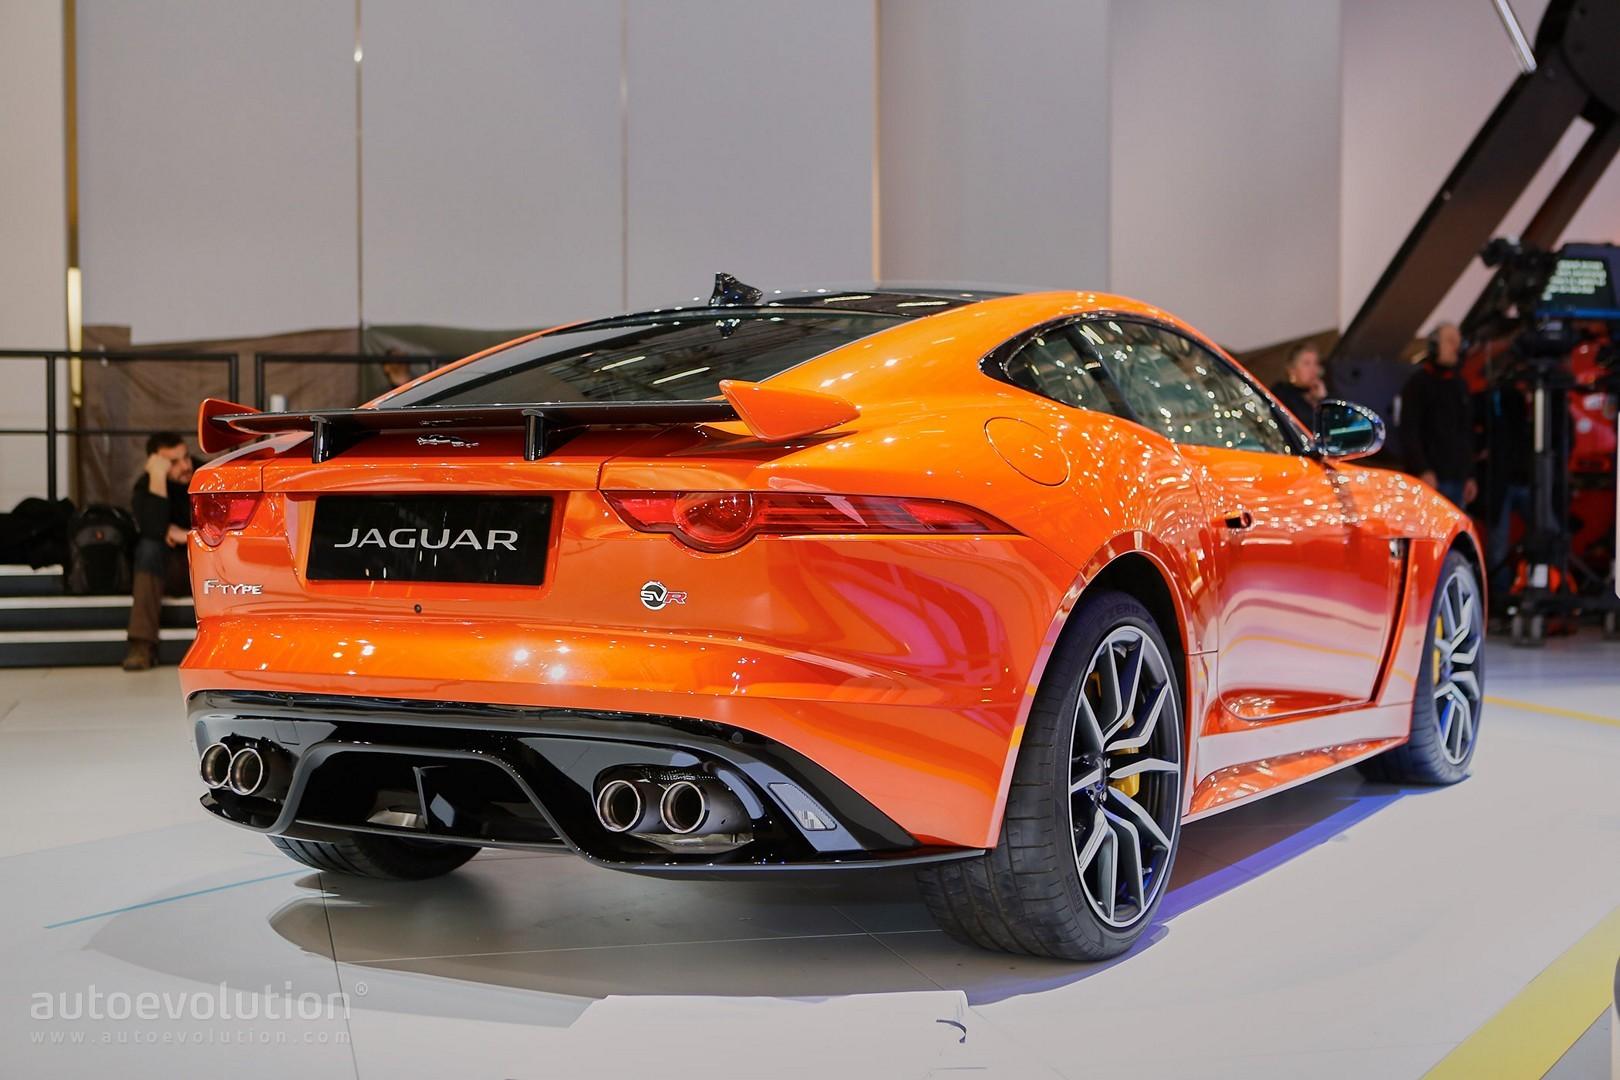 ... Jaguar F Type SVR Coupe And Convertible Live Photos